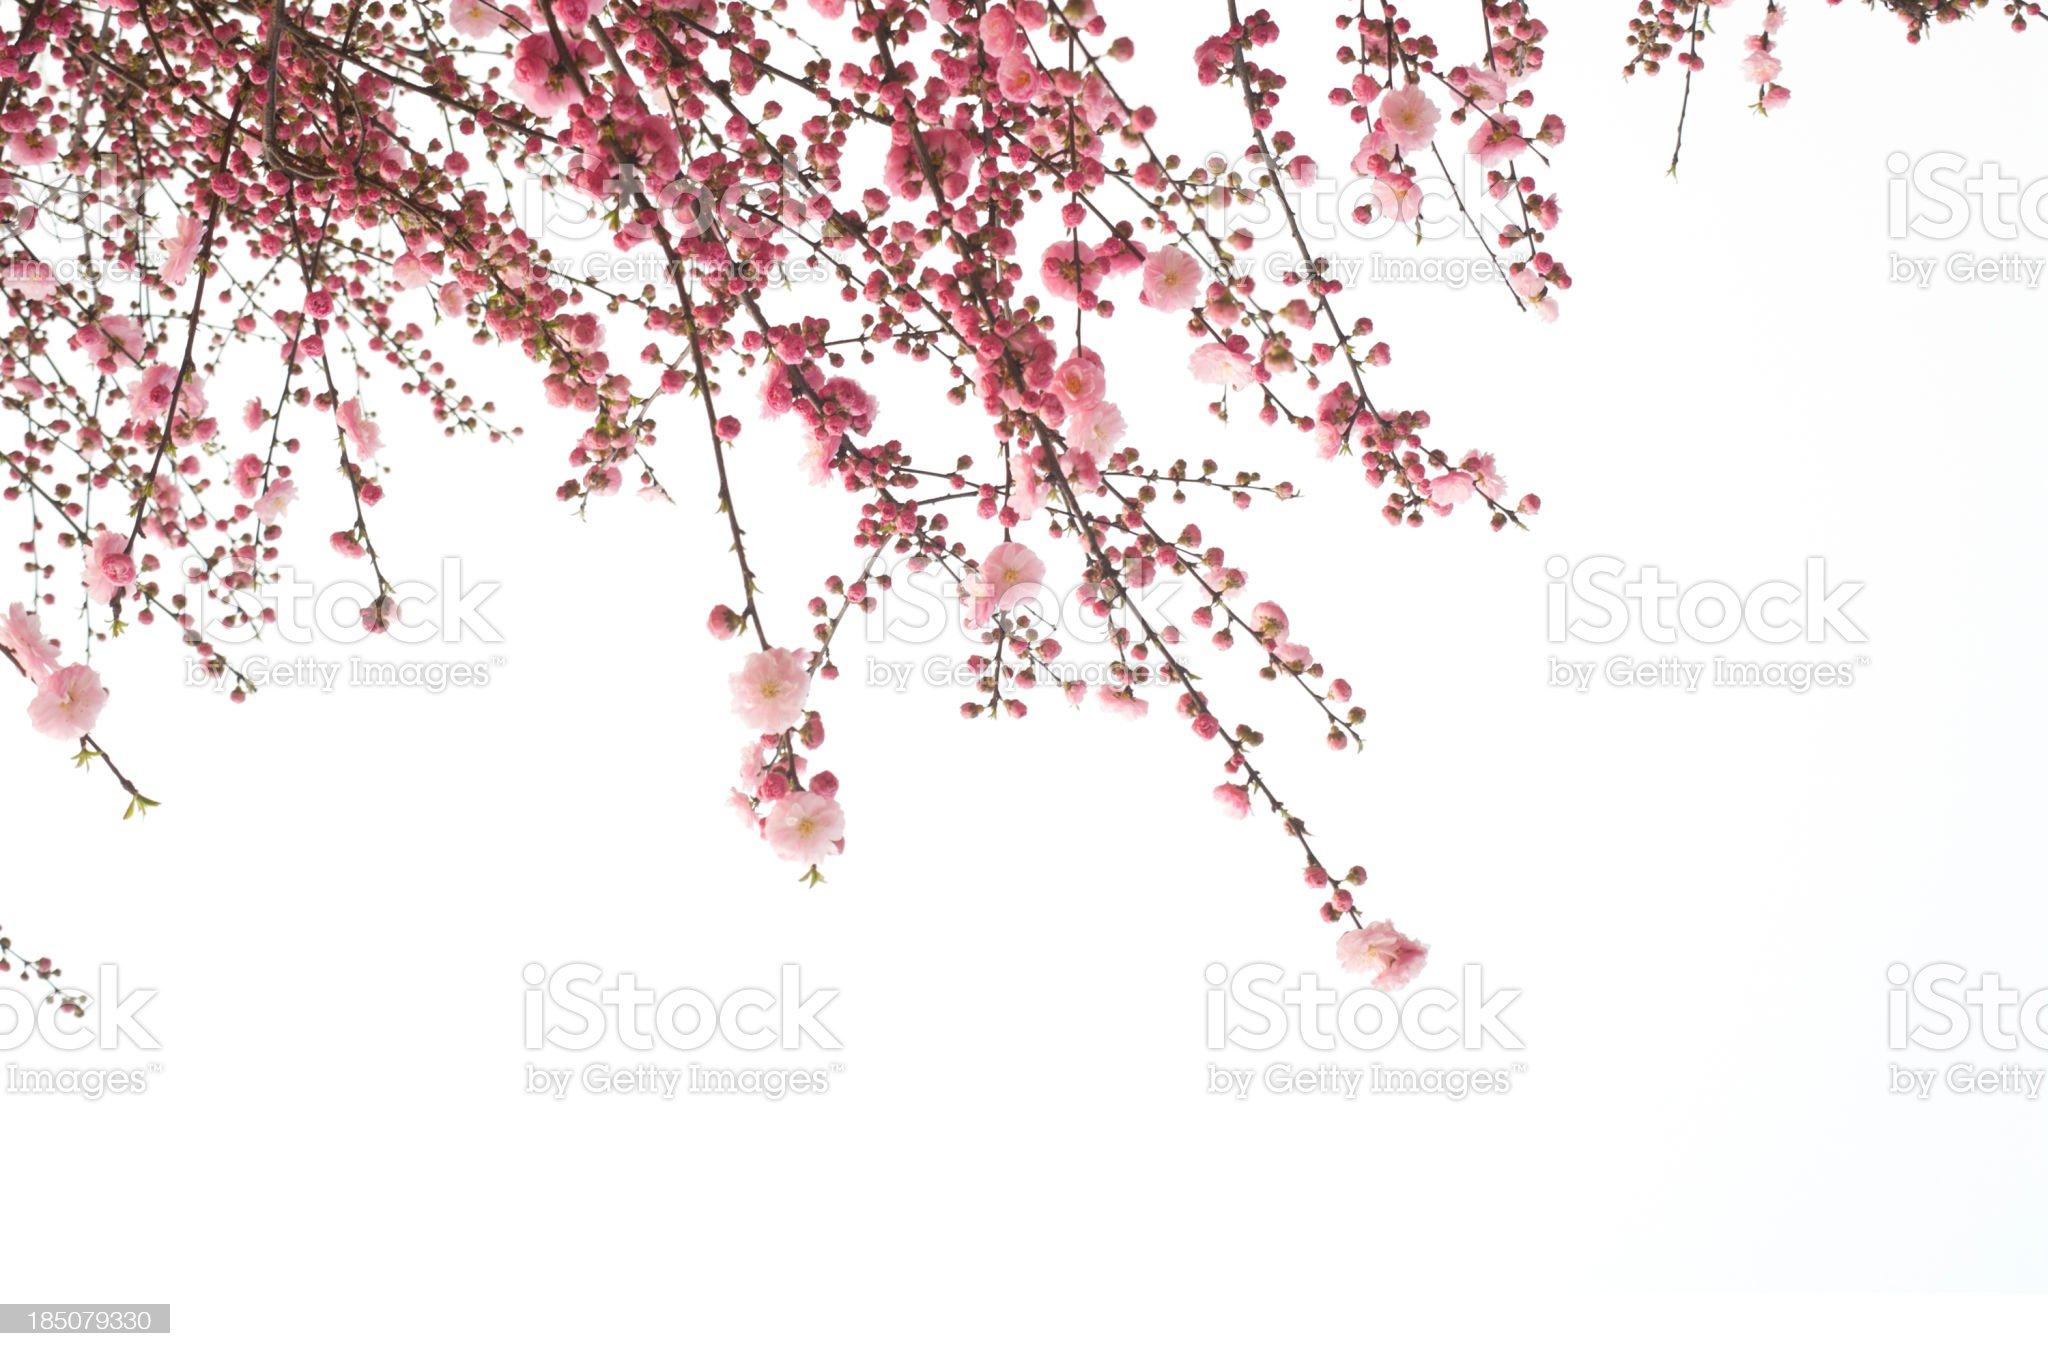 Cherry flower royalty-free stock photo